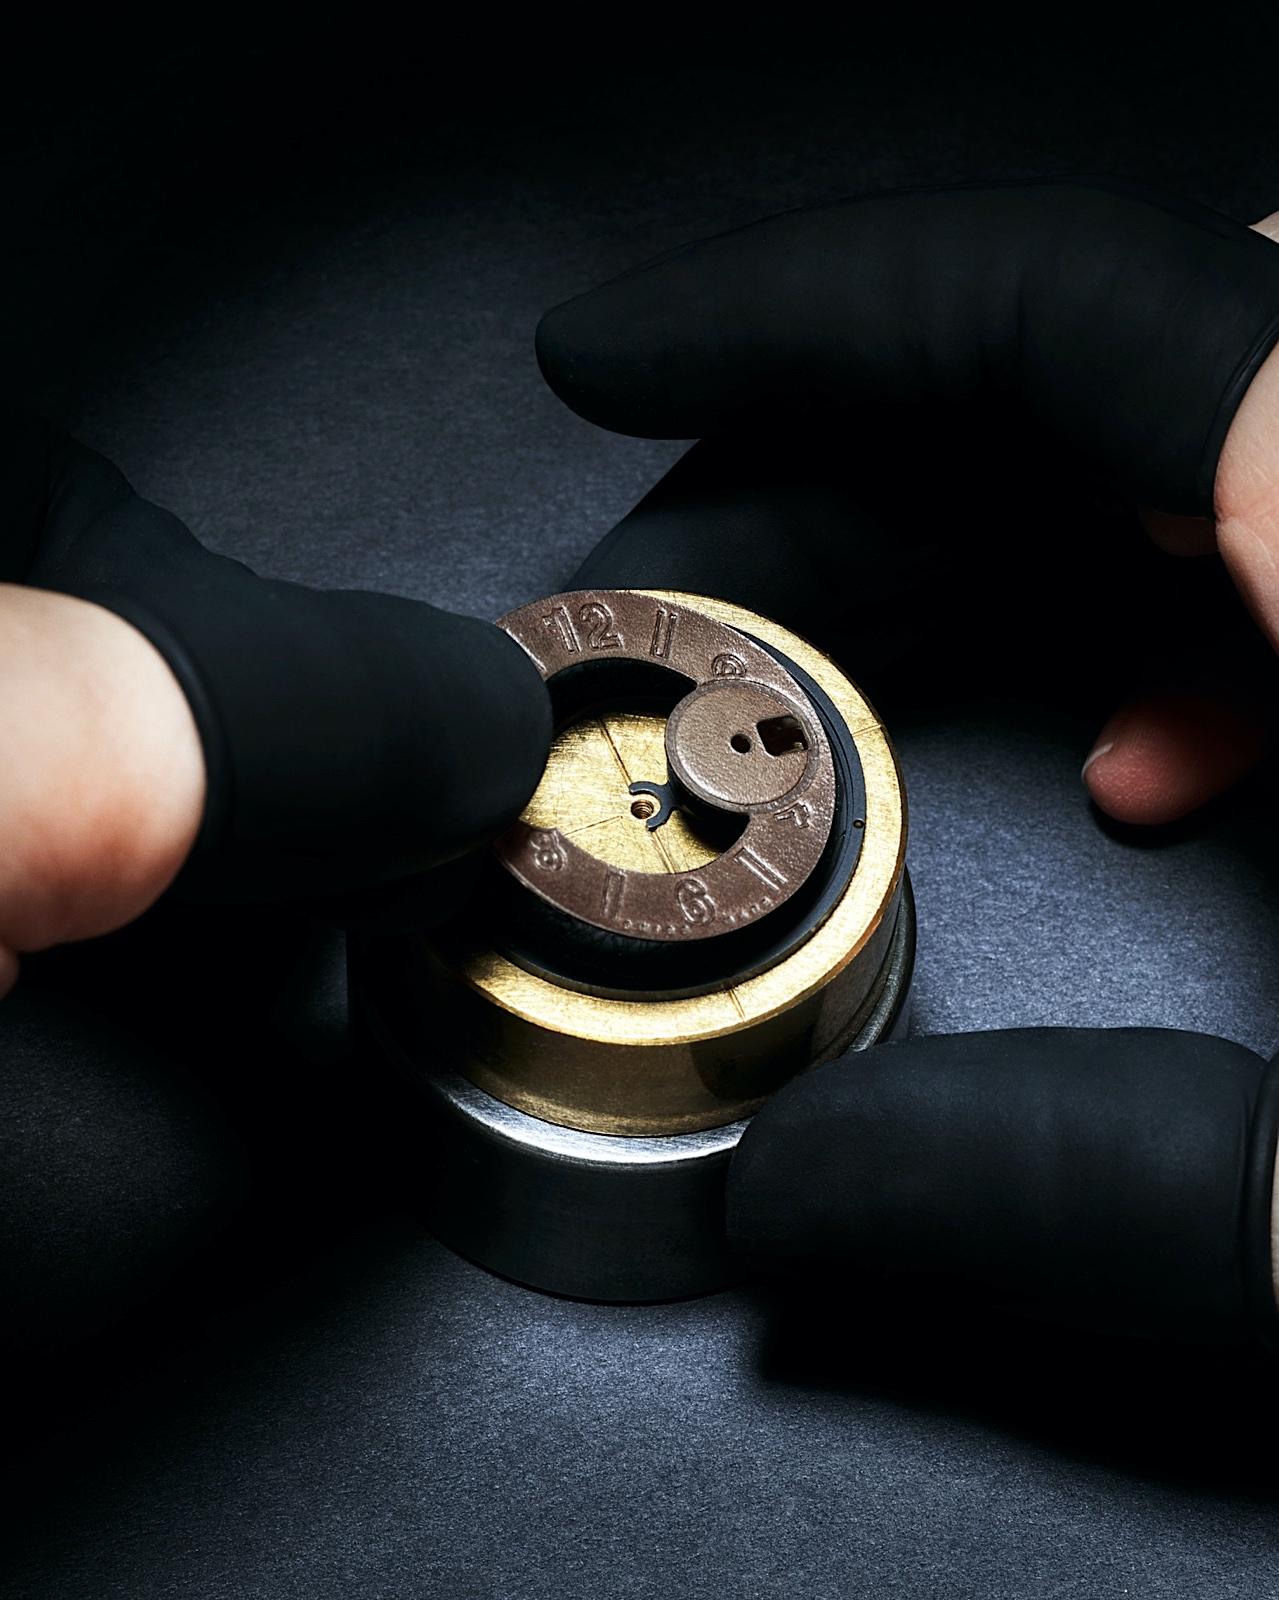 Hublot Big Bang Unico Berluti Cold Brown - dial in Berluti leather